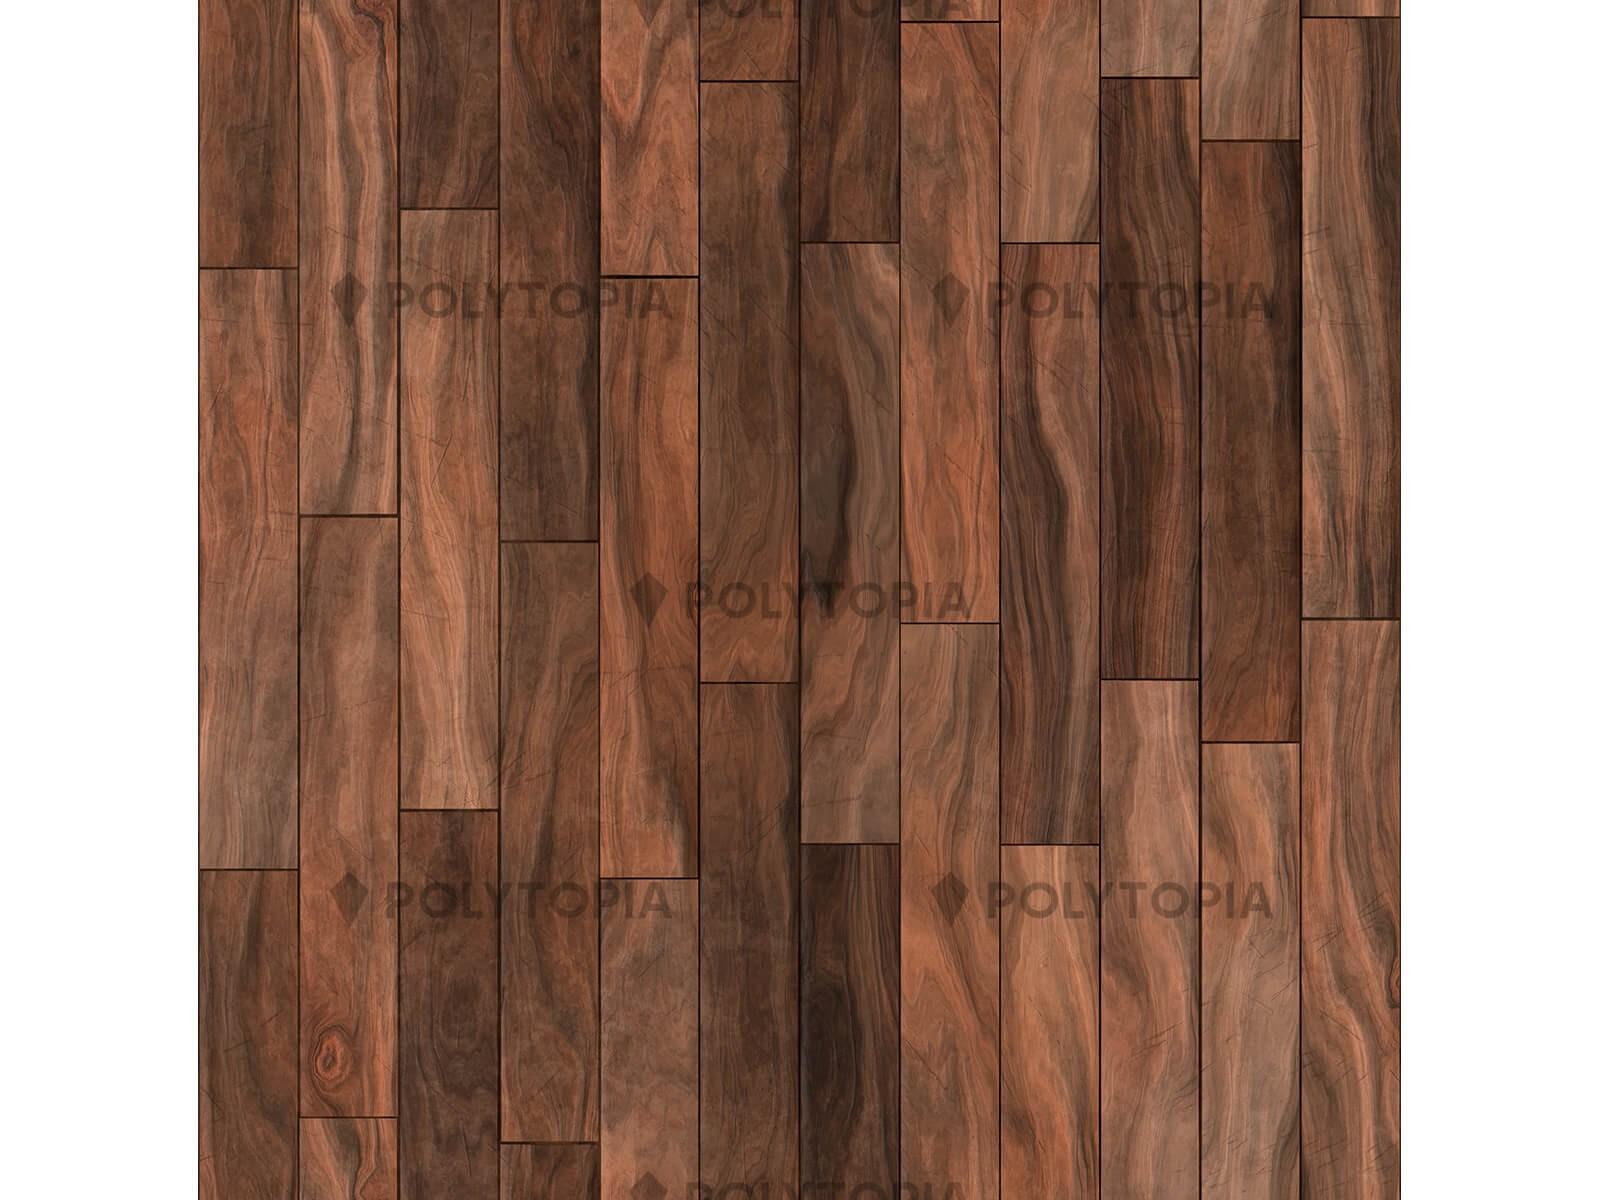 Wood parquet texture 7